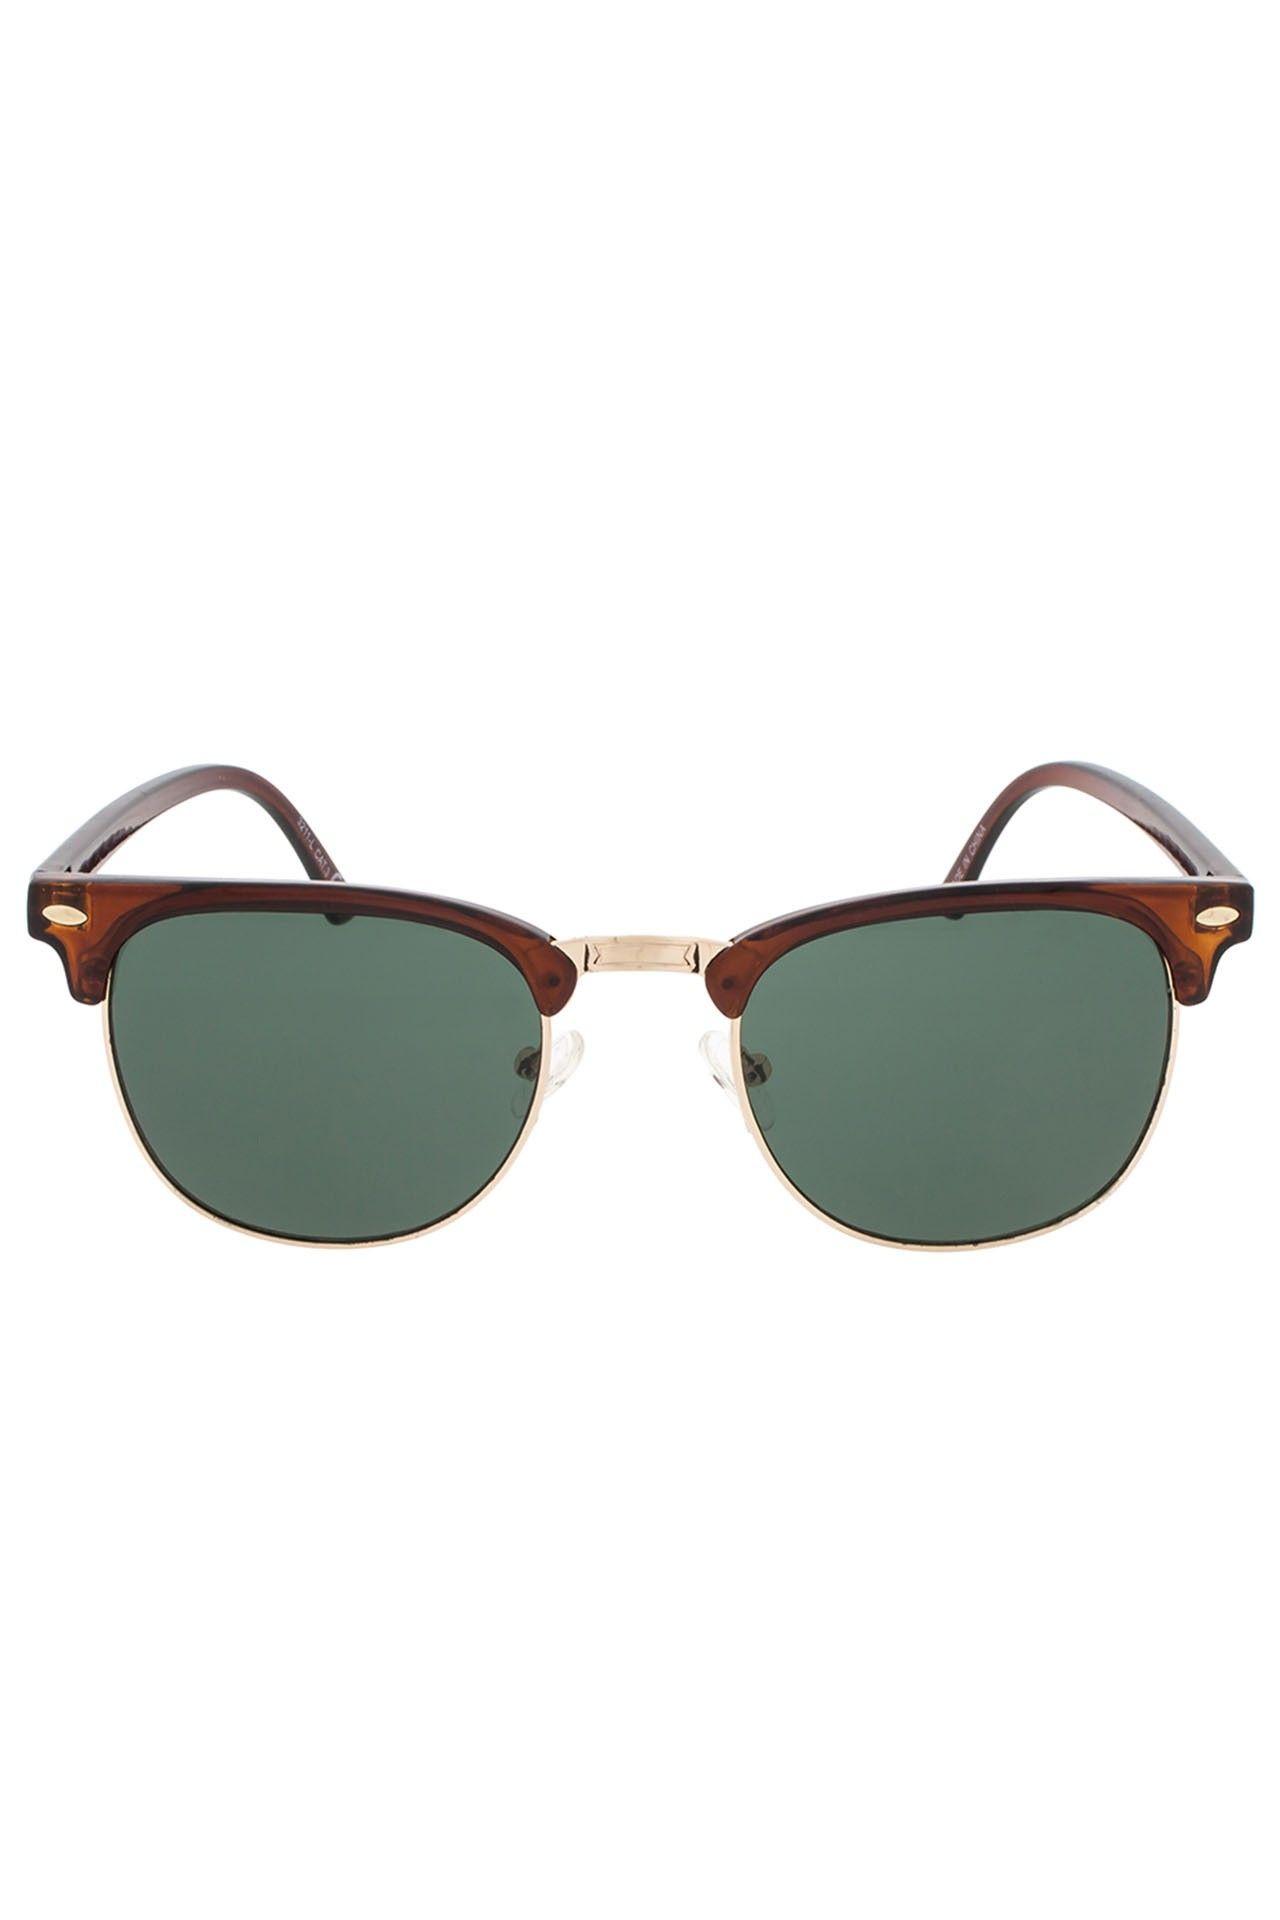 Afbeelding van Icon Eyewear 3211-L L Zonnebril Dark Clear Brown